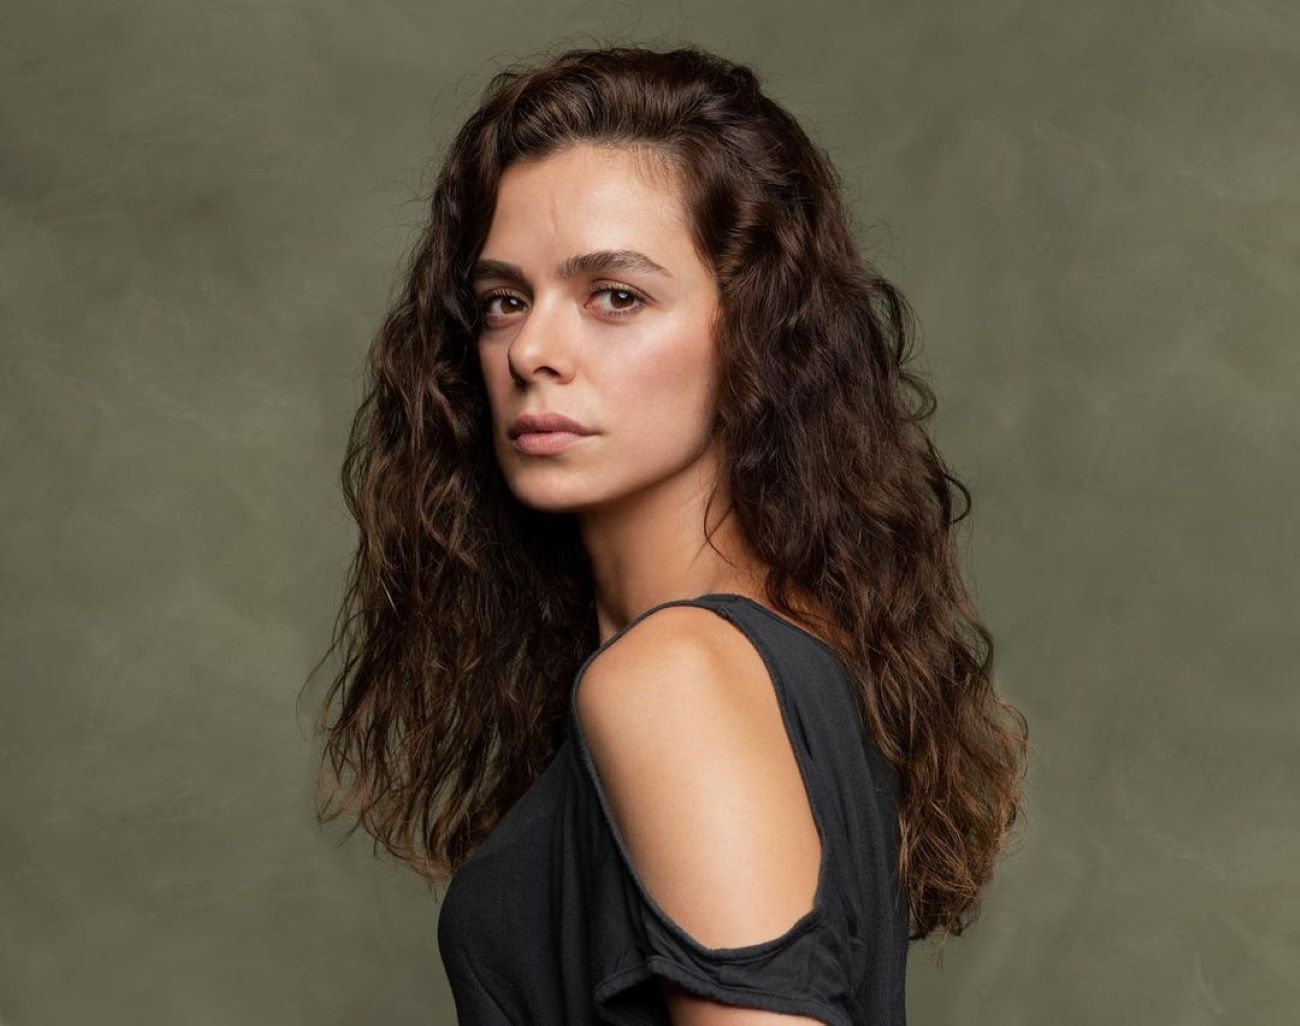 Özge Özpirinçci, Bahar en 'Mujer', será pareja de Kivanç Tatlitug en una nueva serie